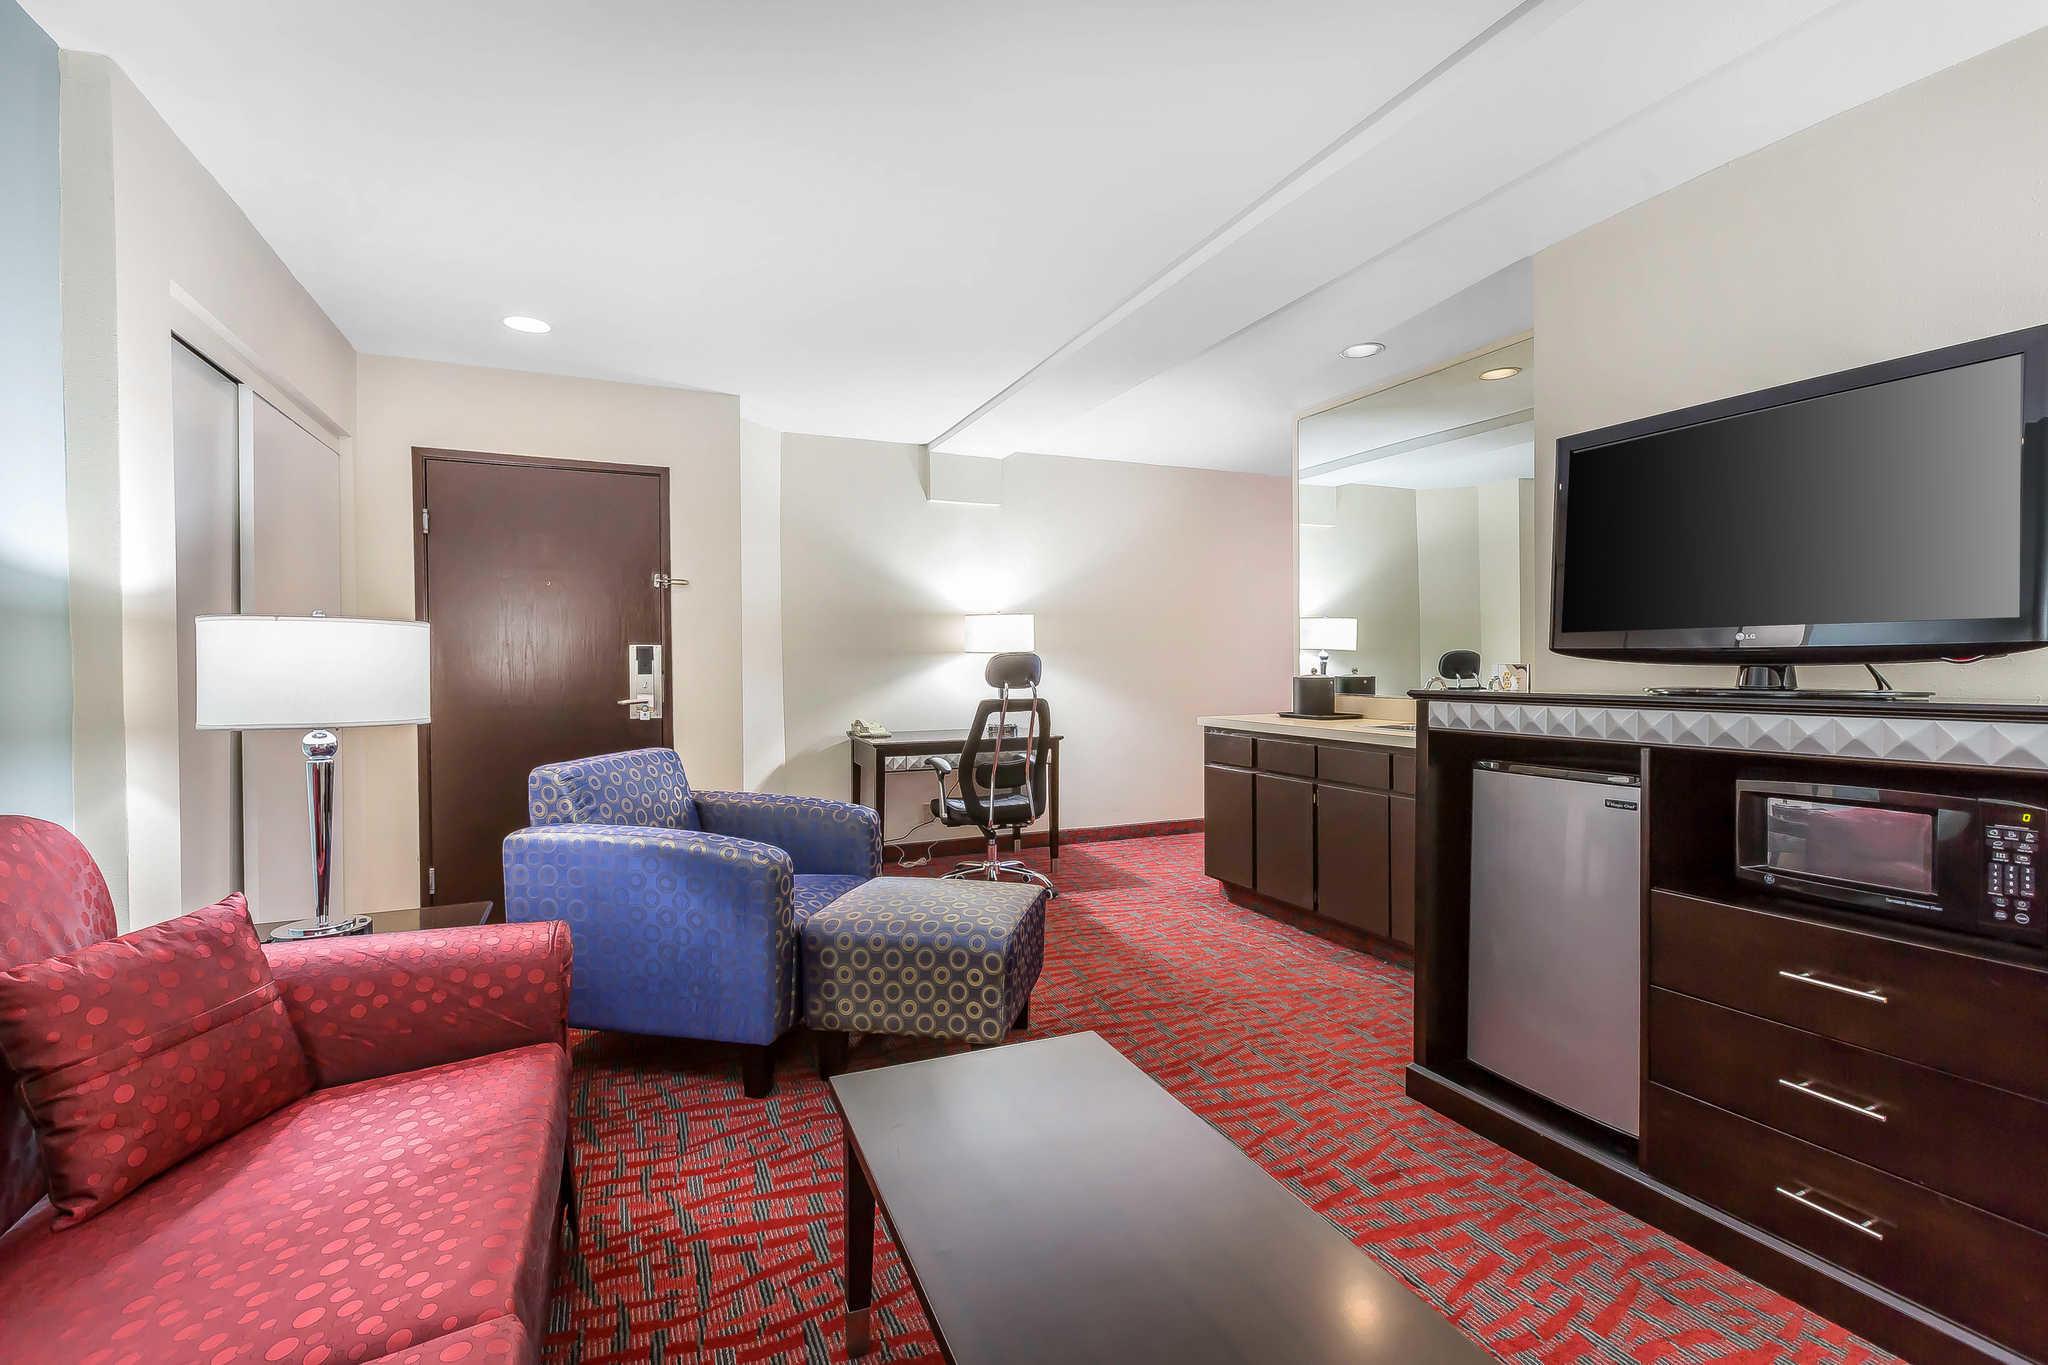 Room For Rent Near Irvine Spectrum